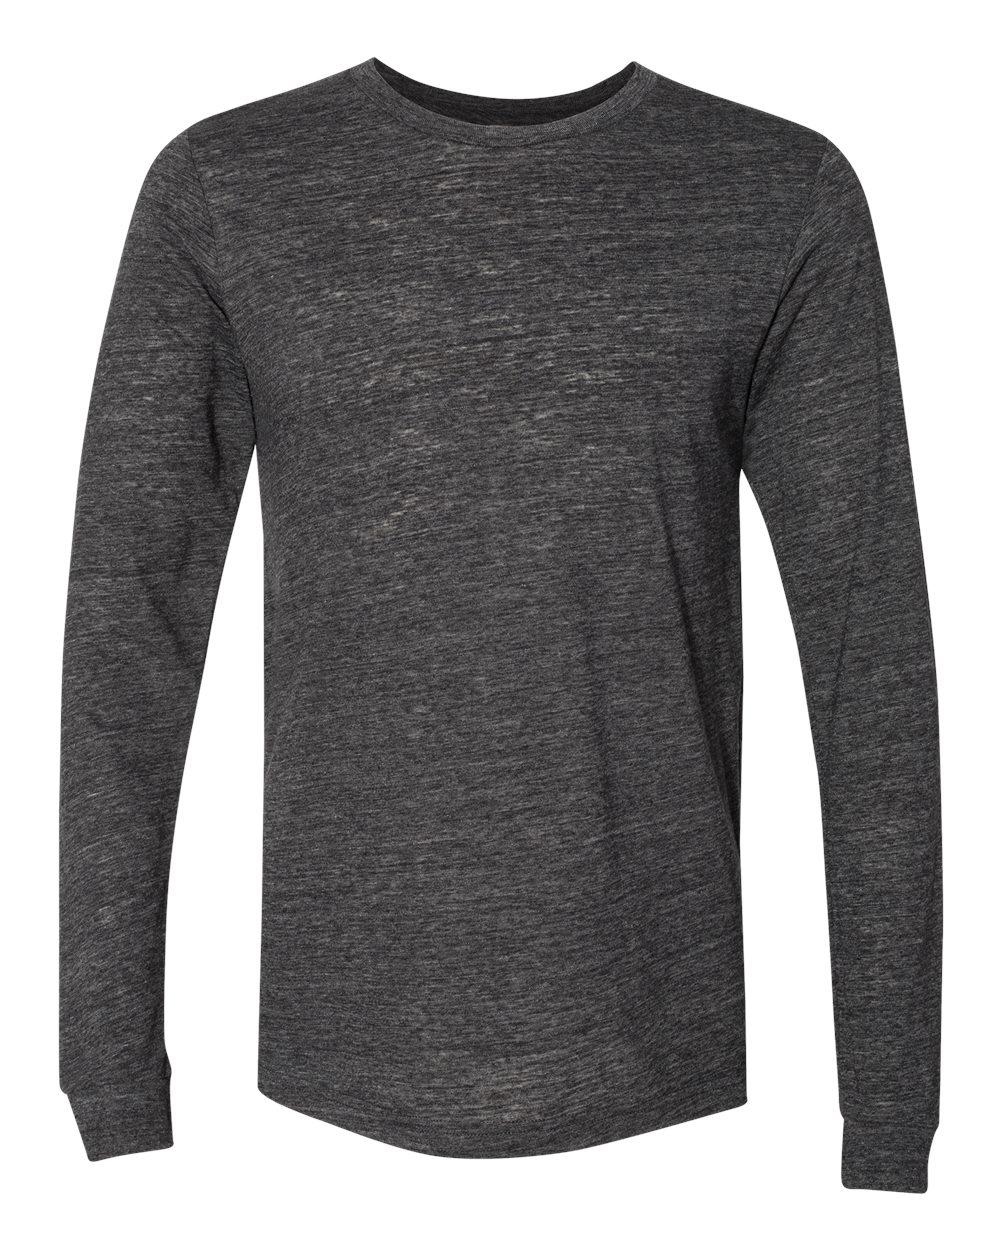 Bella-Canvas-Mens-Blank-Top-Long-Sleeve-Jersey-Tee-T-Shirt-3501-up-to-3XL thumbnail 30